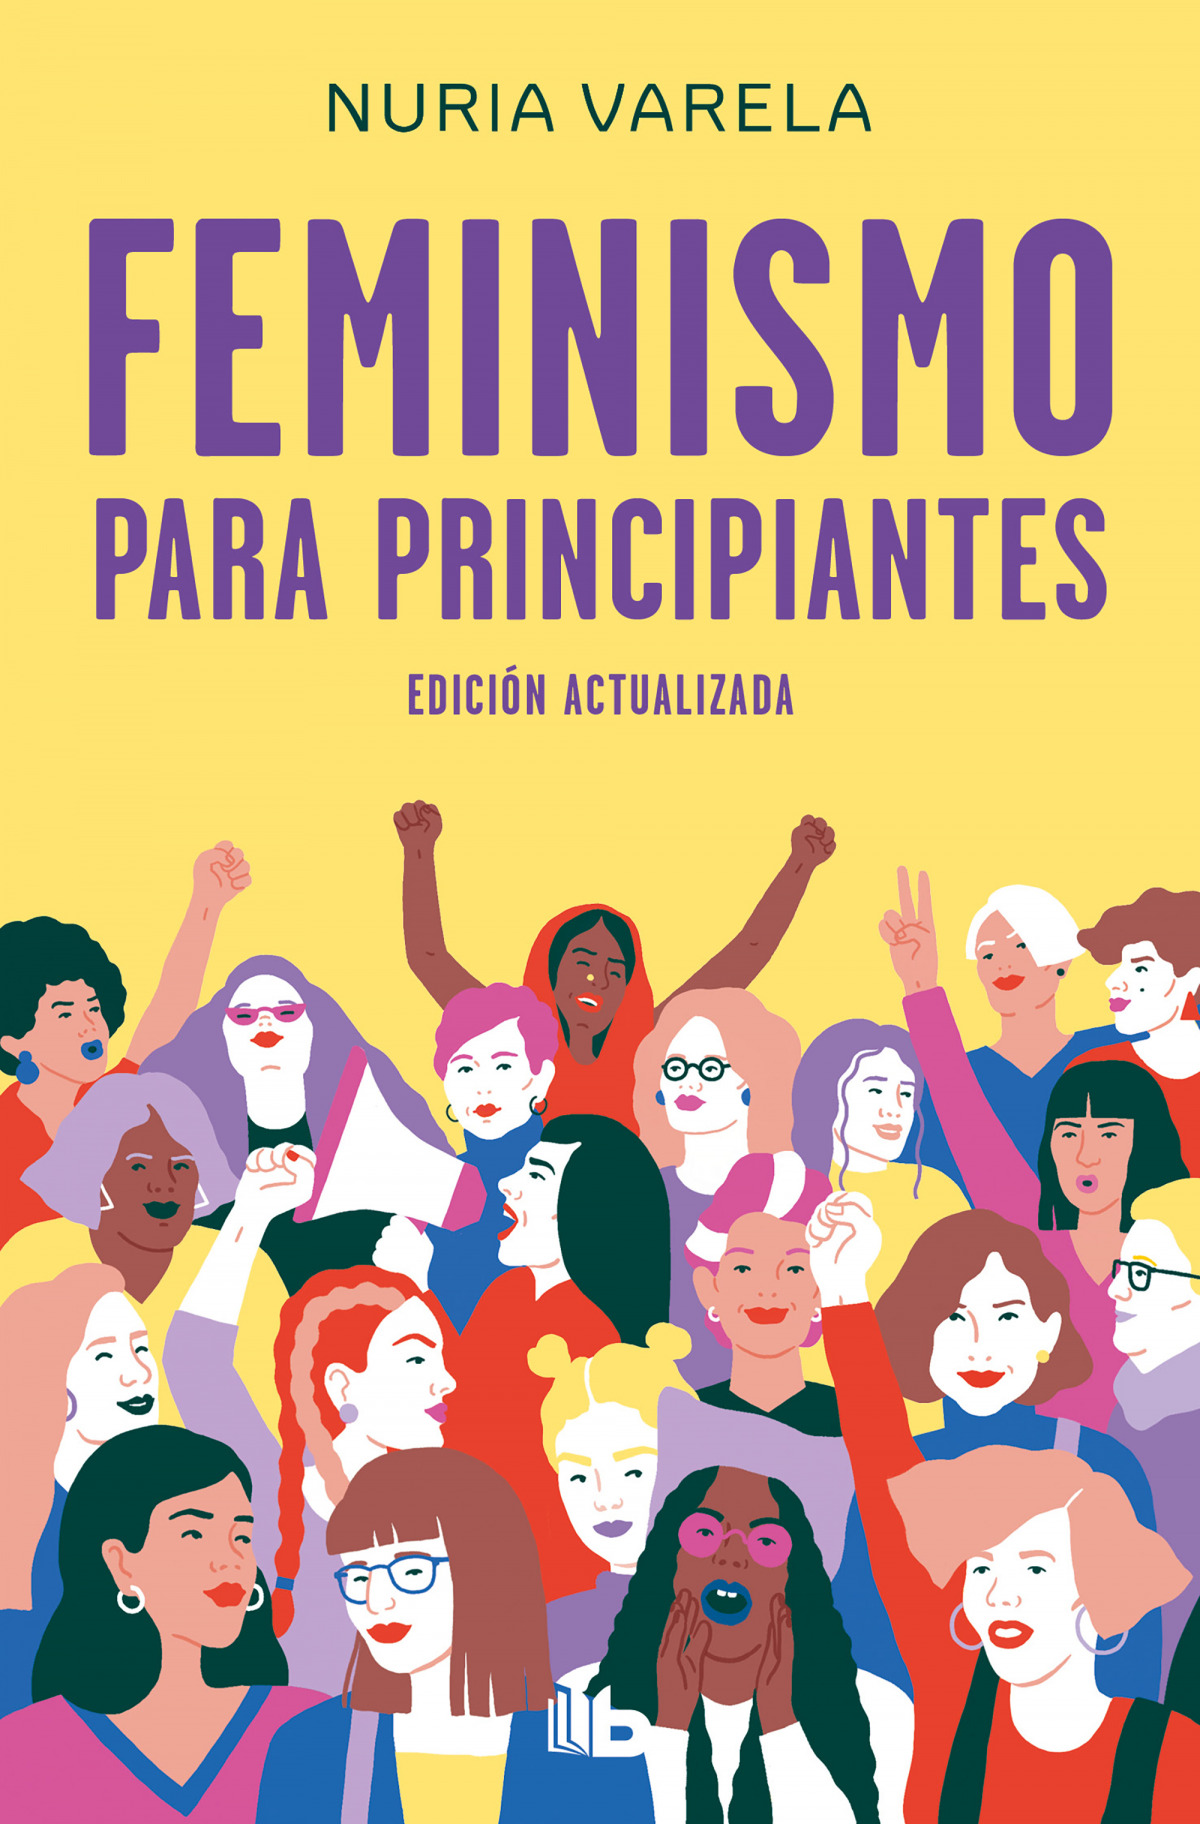 FEMINISMO PARA PRINCIPIANTES 9788413140803